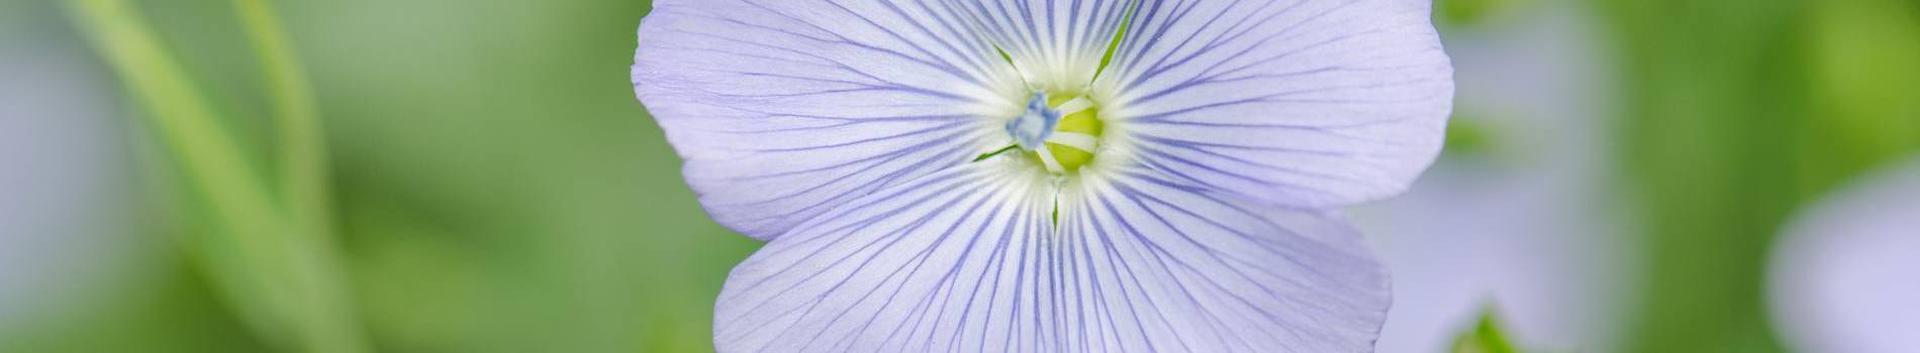 01291_muude-taimede-kasvatus_28765775_xl.jpg